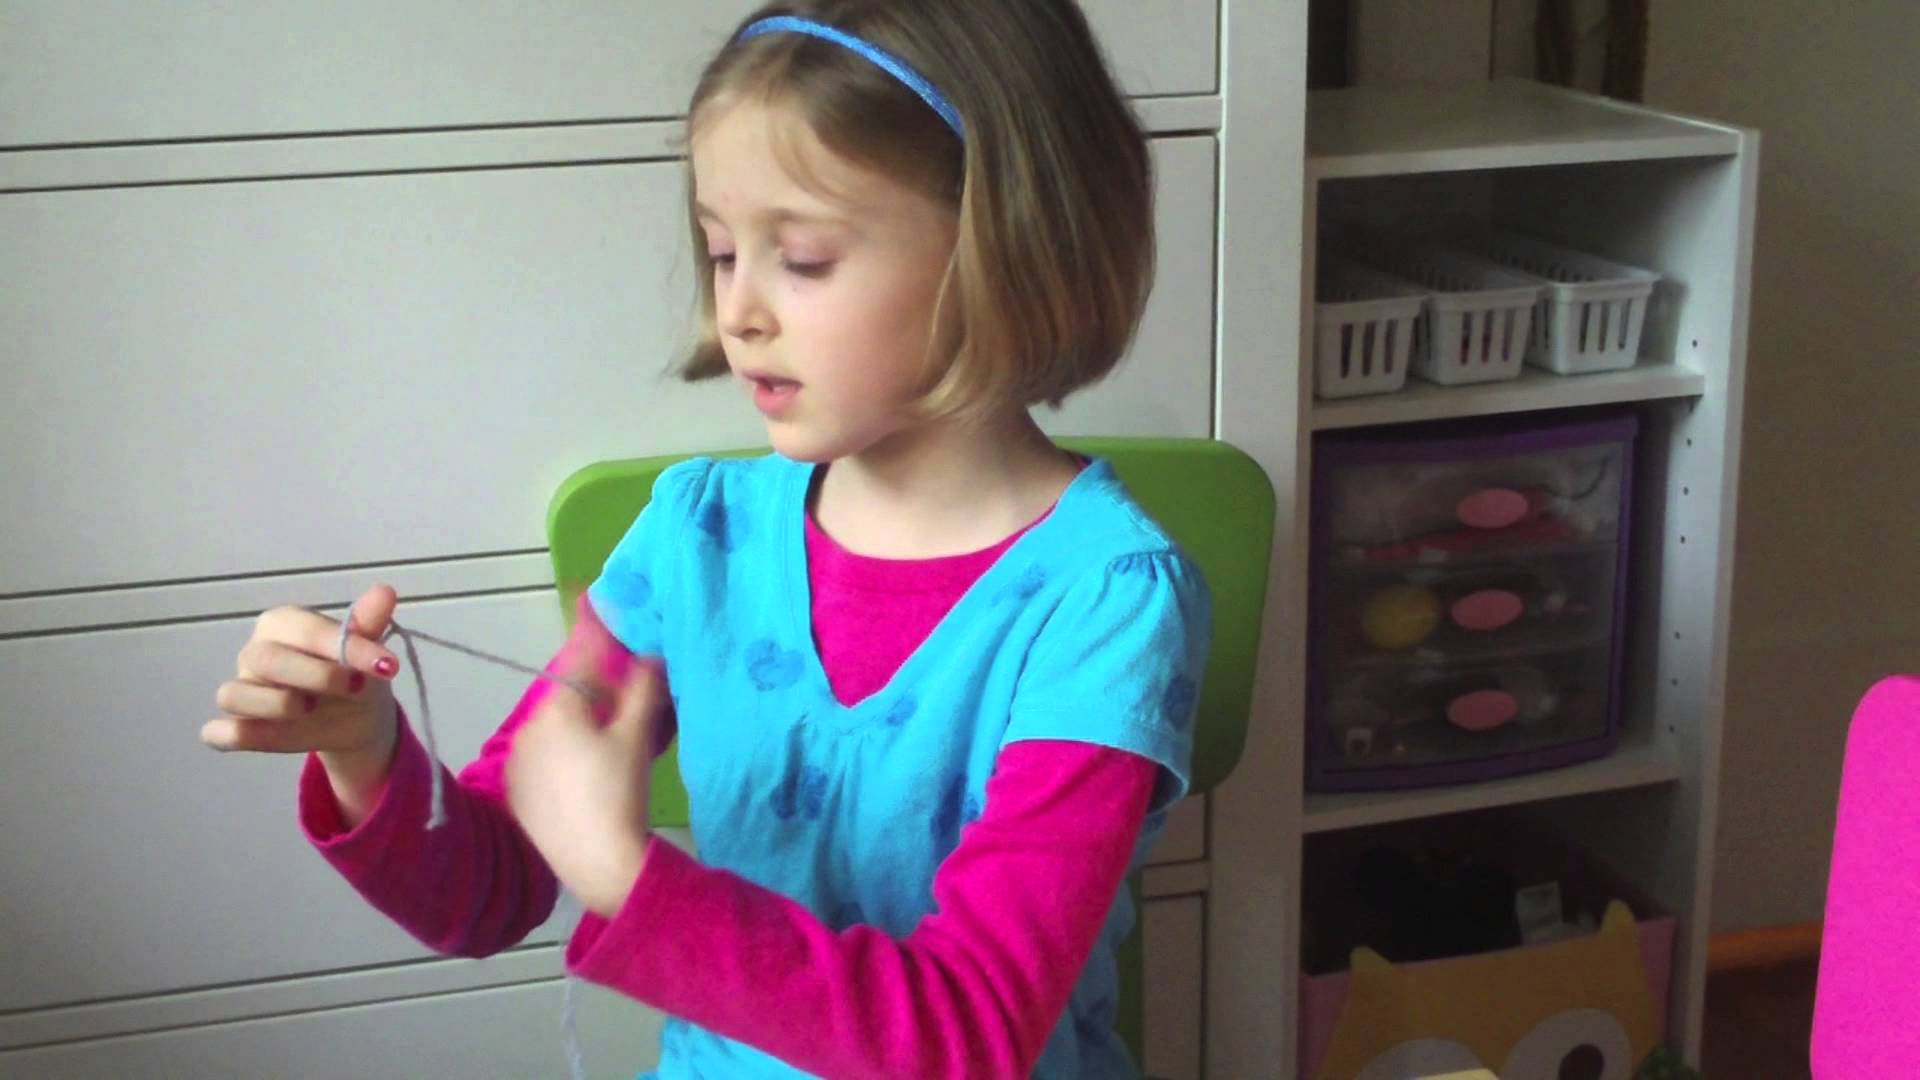 crochet kids learn how to finger crochet with kids - youtube zsuwere